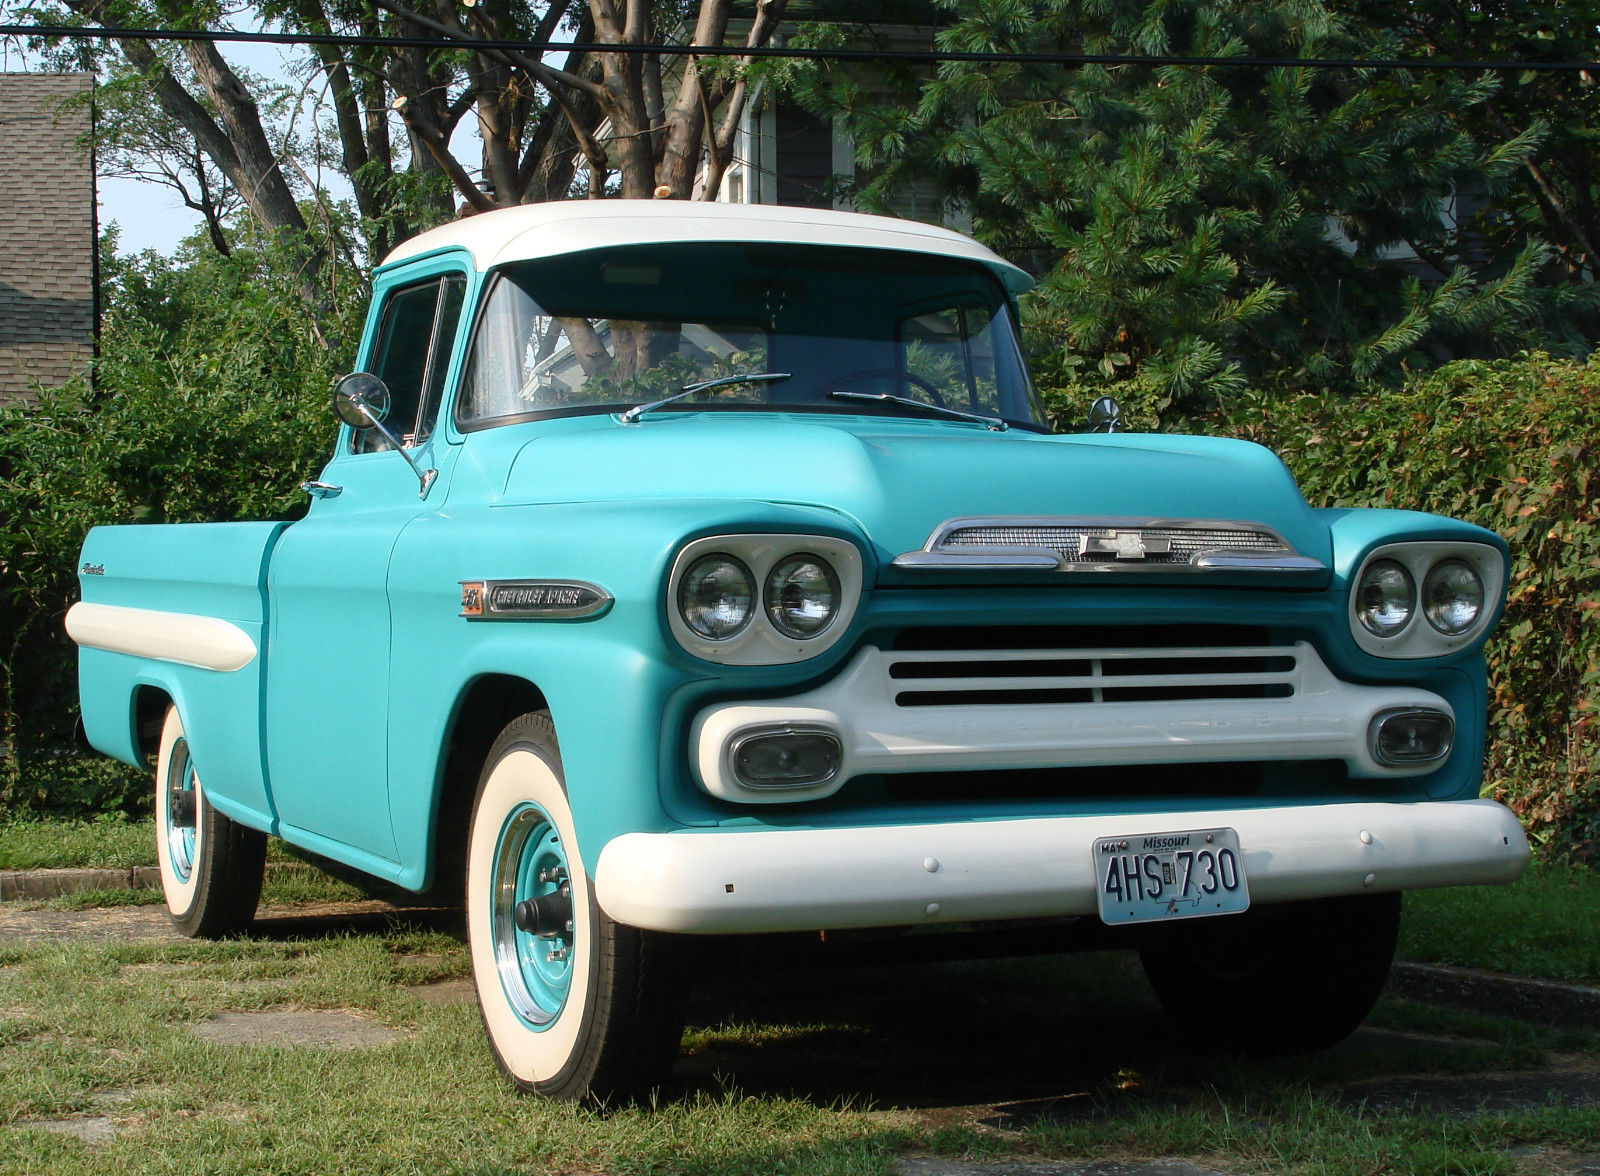 All American Classic Cars: 1959 Chevrolet Apache Fleetside